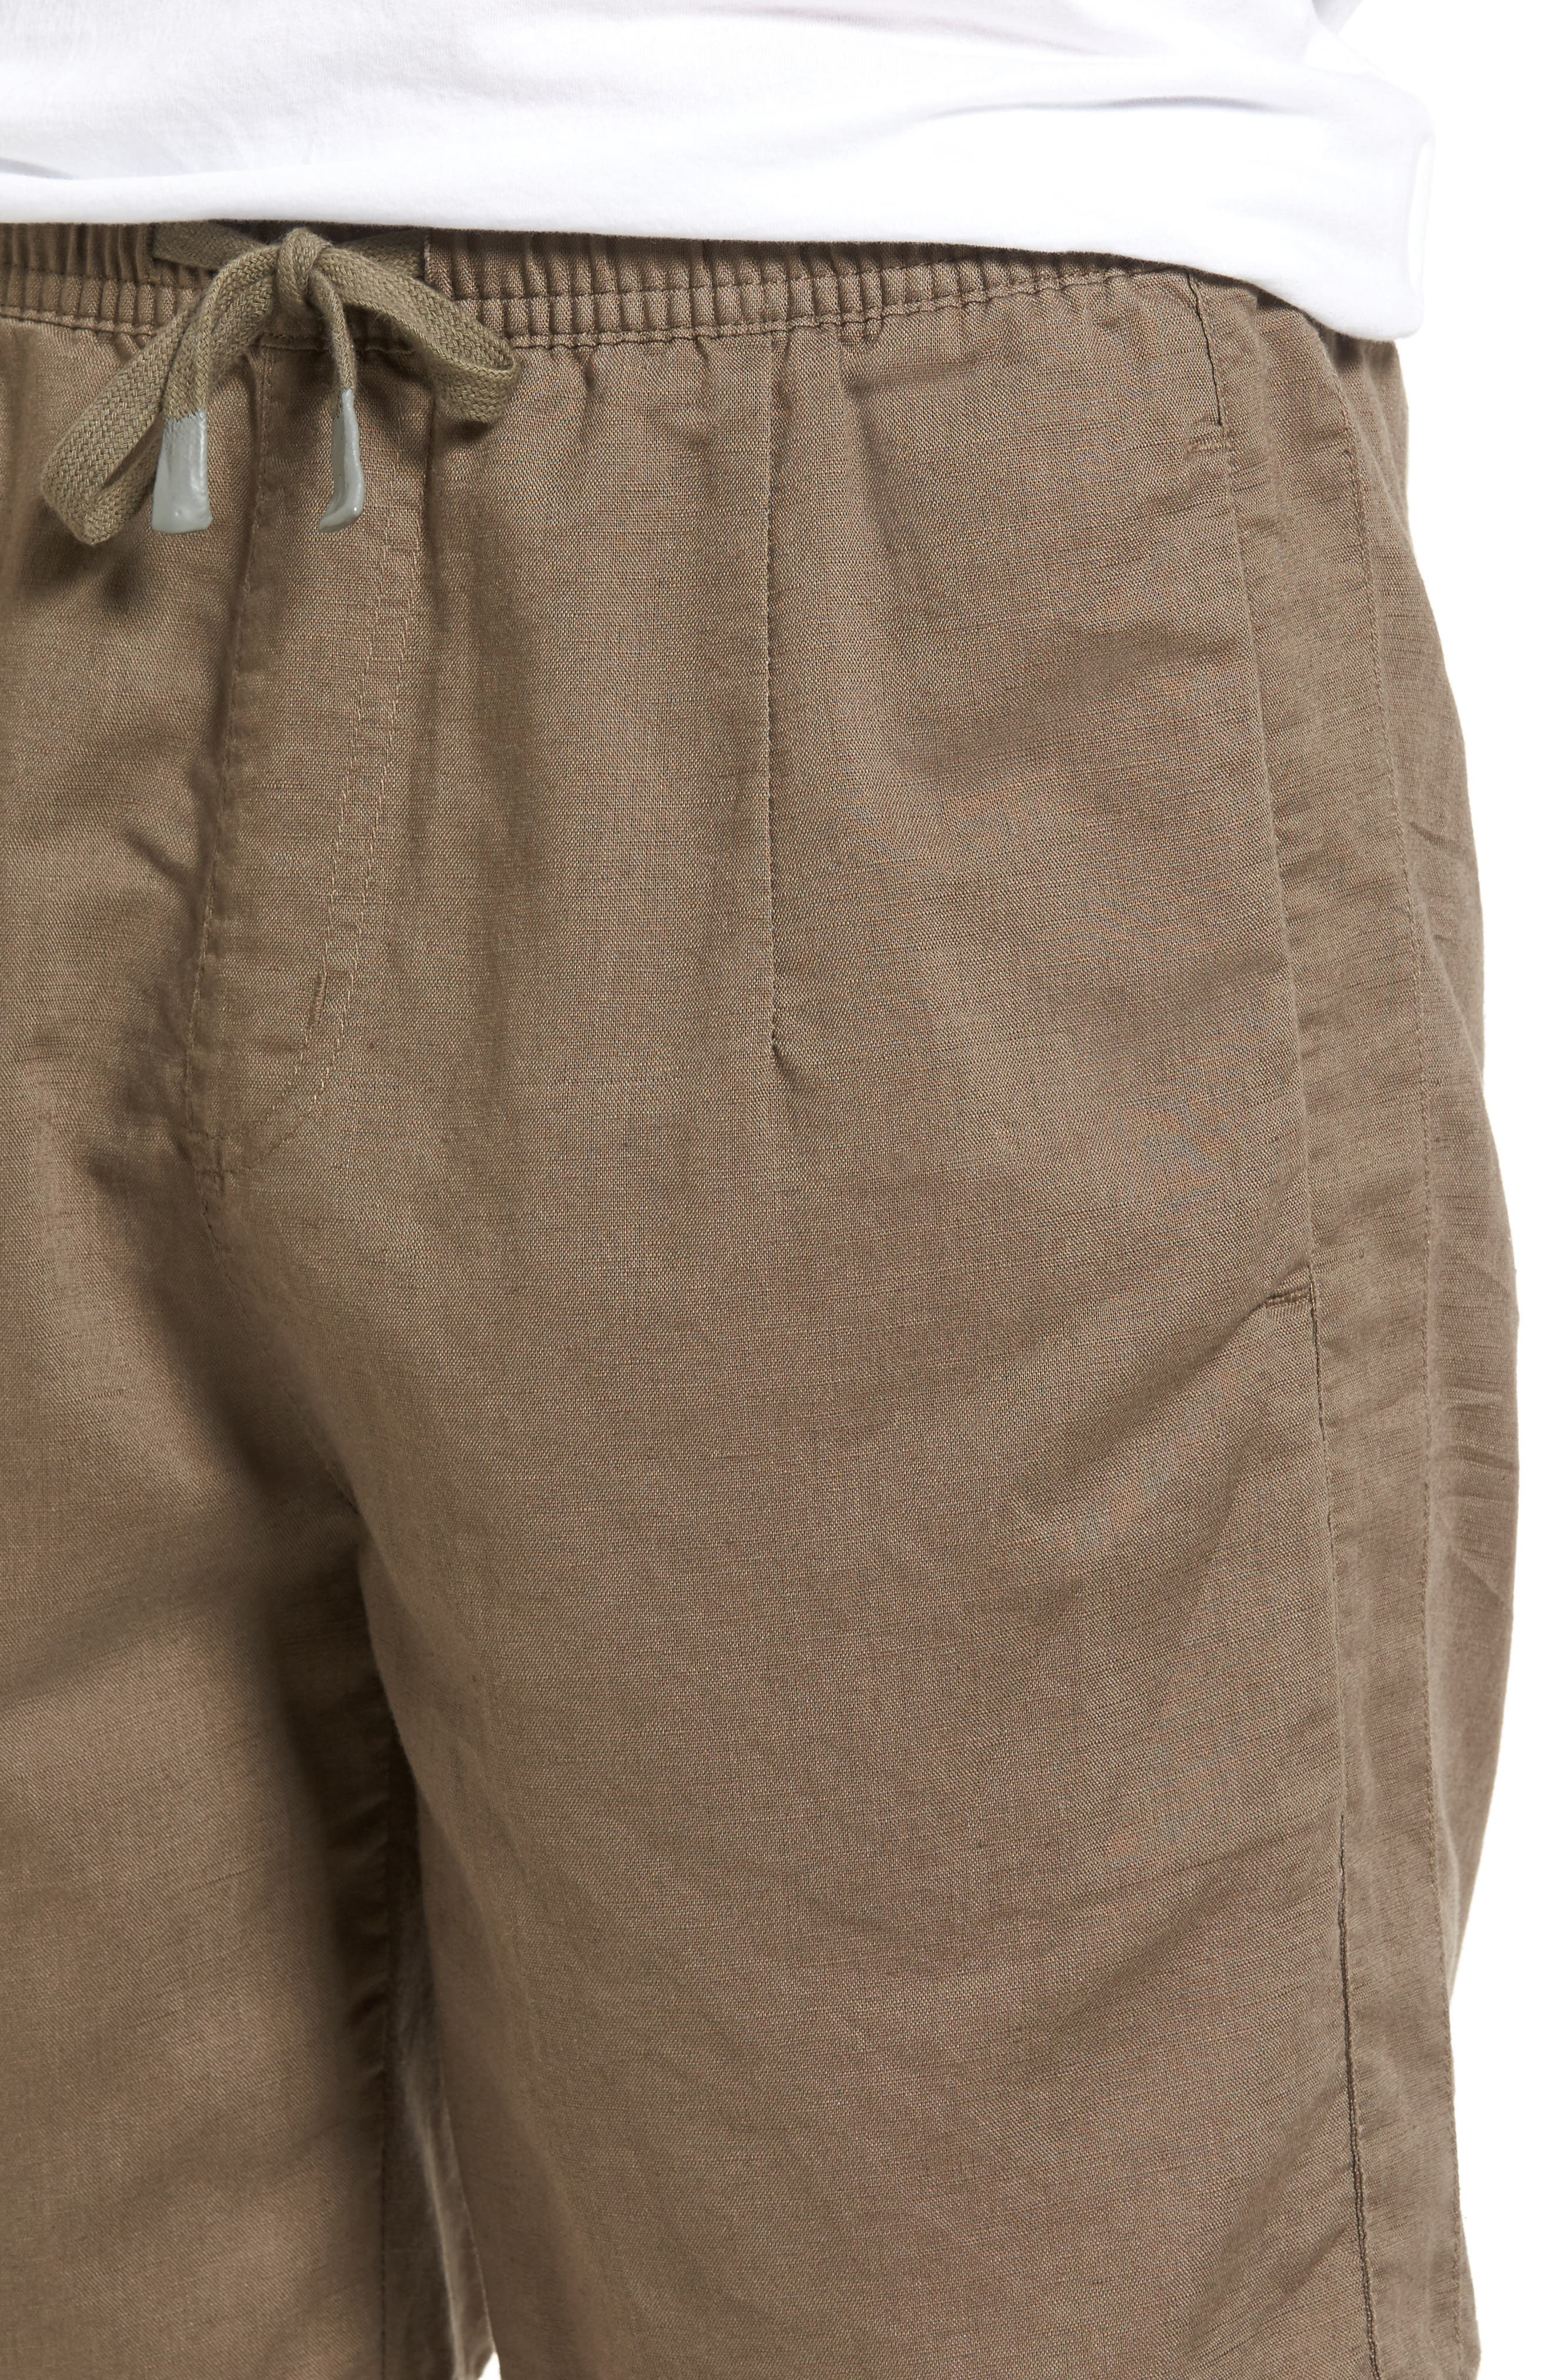 Omni Linen Blend Shorts,                             Alternate thumbnail 4, color,                             310